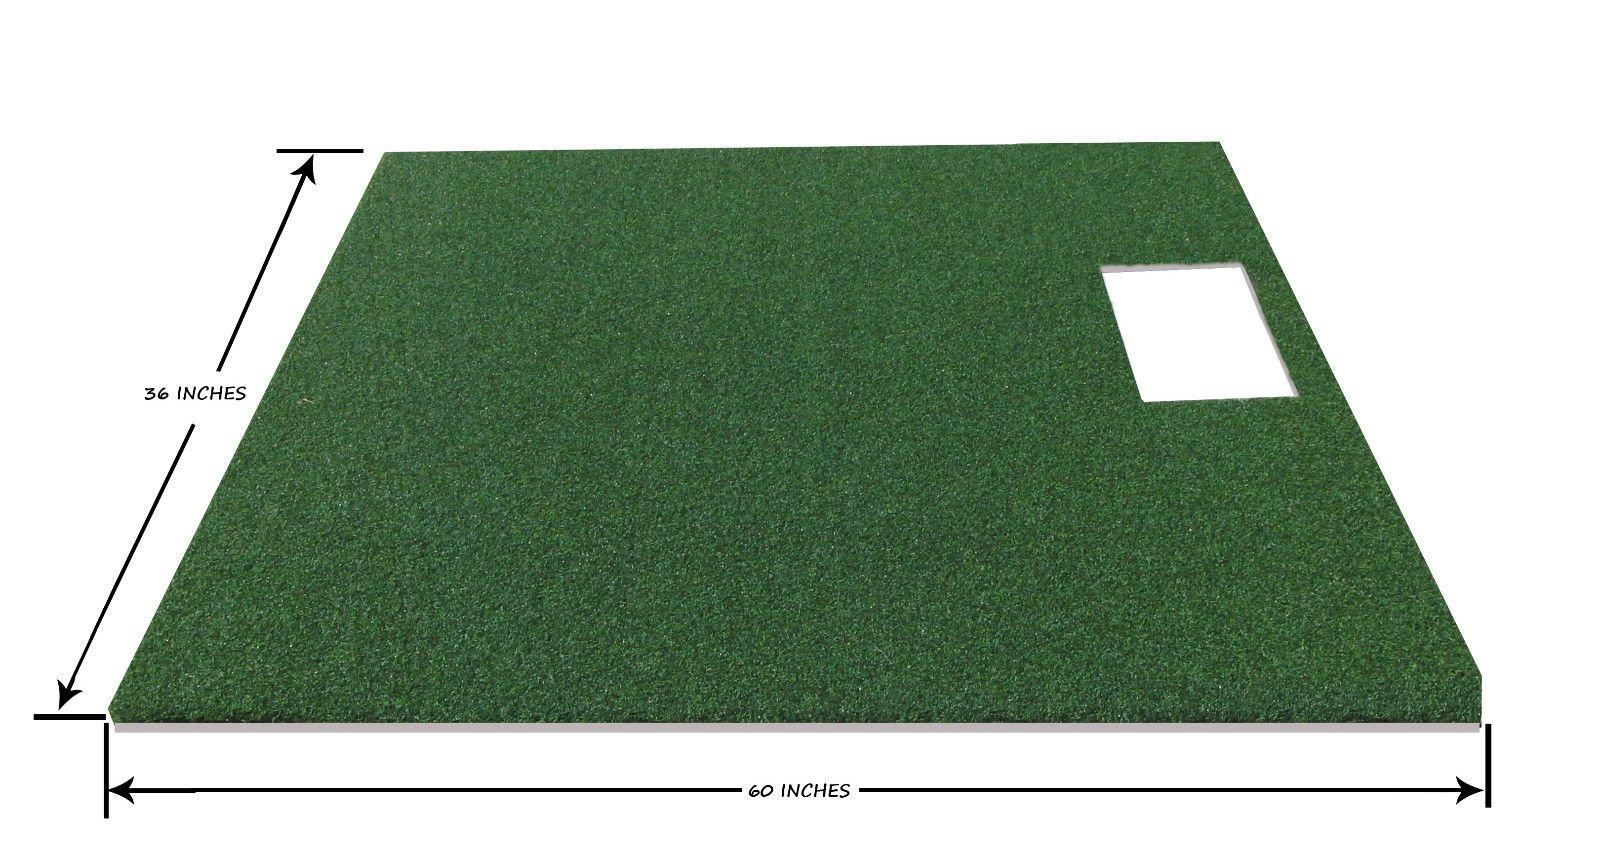 PREMIUM PRO TURF 3' x 5' Full Stance Golf Mat For The OptiShot Golf Simulator- 5mm Foam Backing